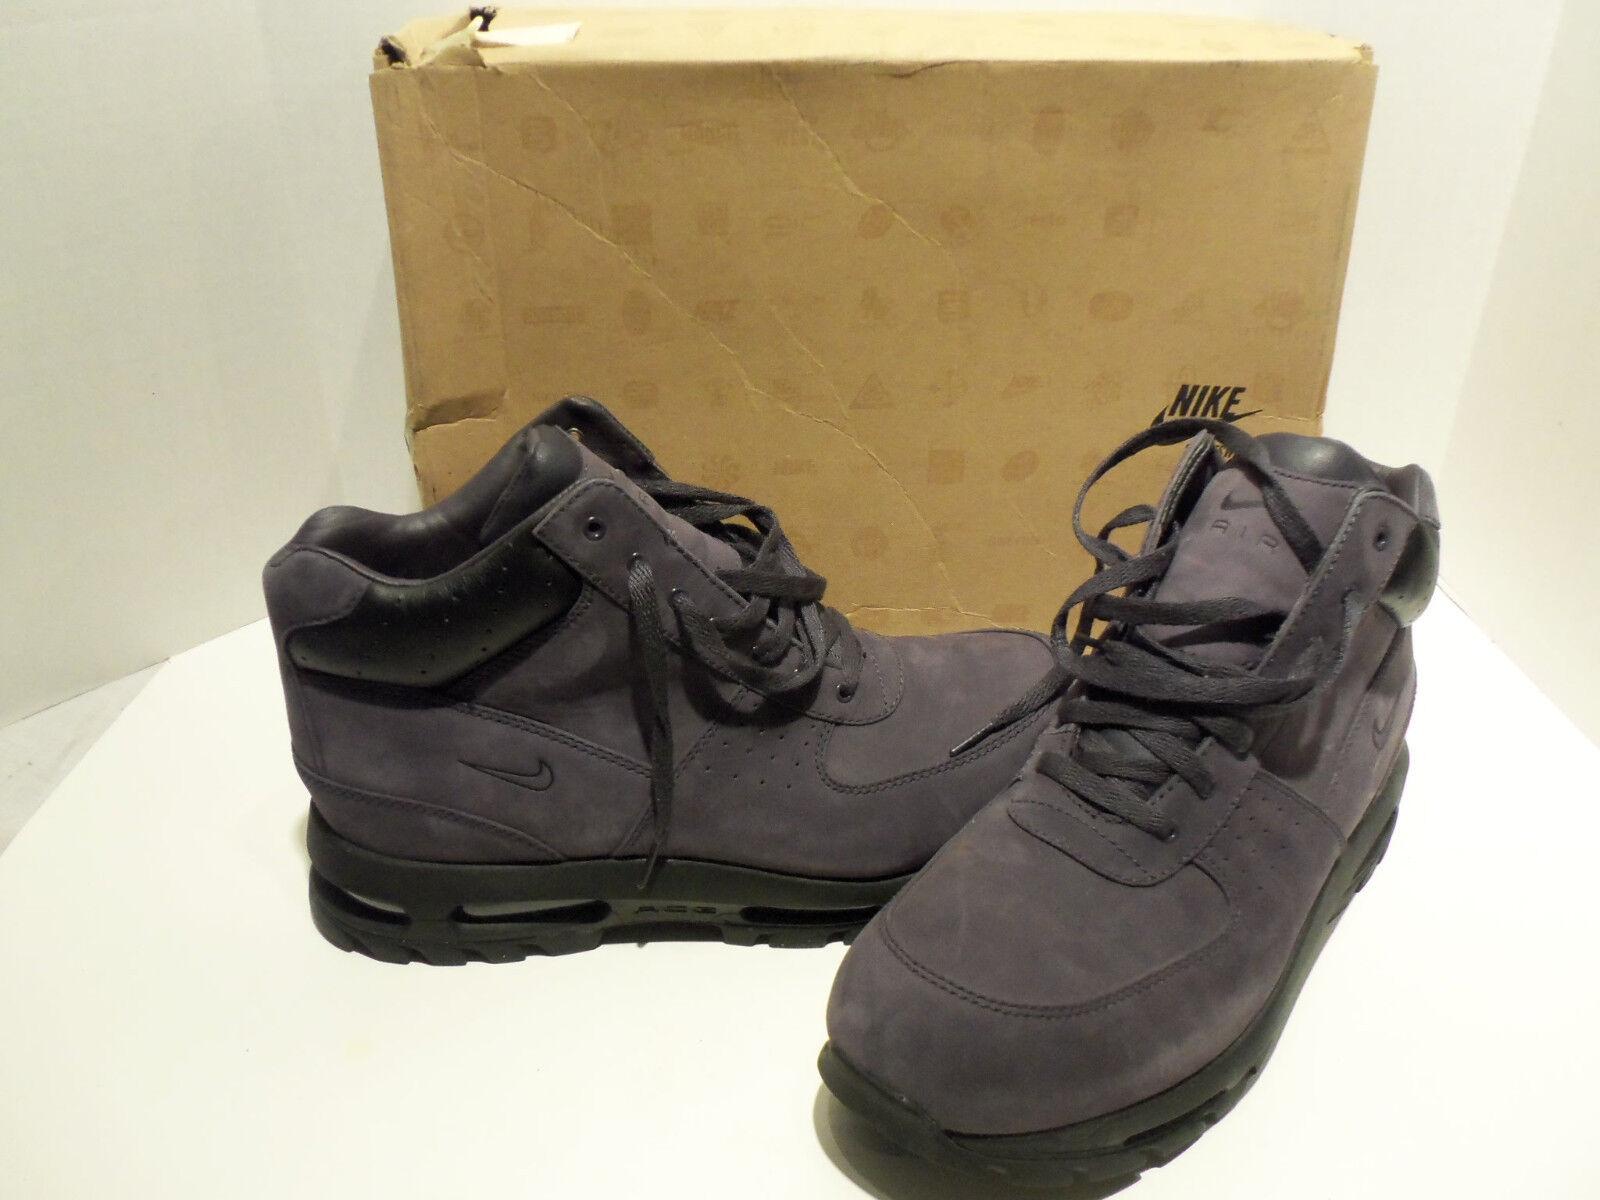 Nike air max goadome tt tutti quei acg viola stivali neri scarpe taglia: 13 noi 12 uk